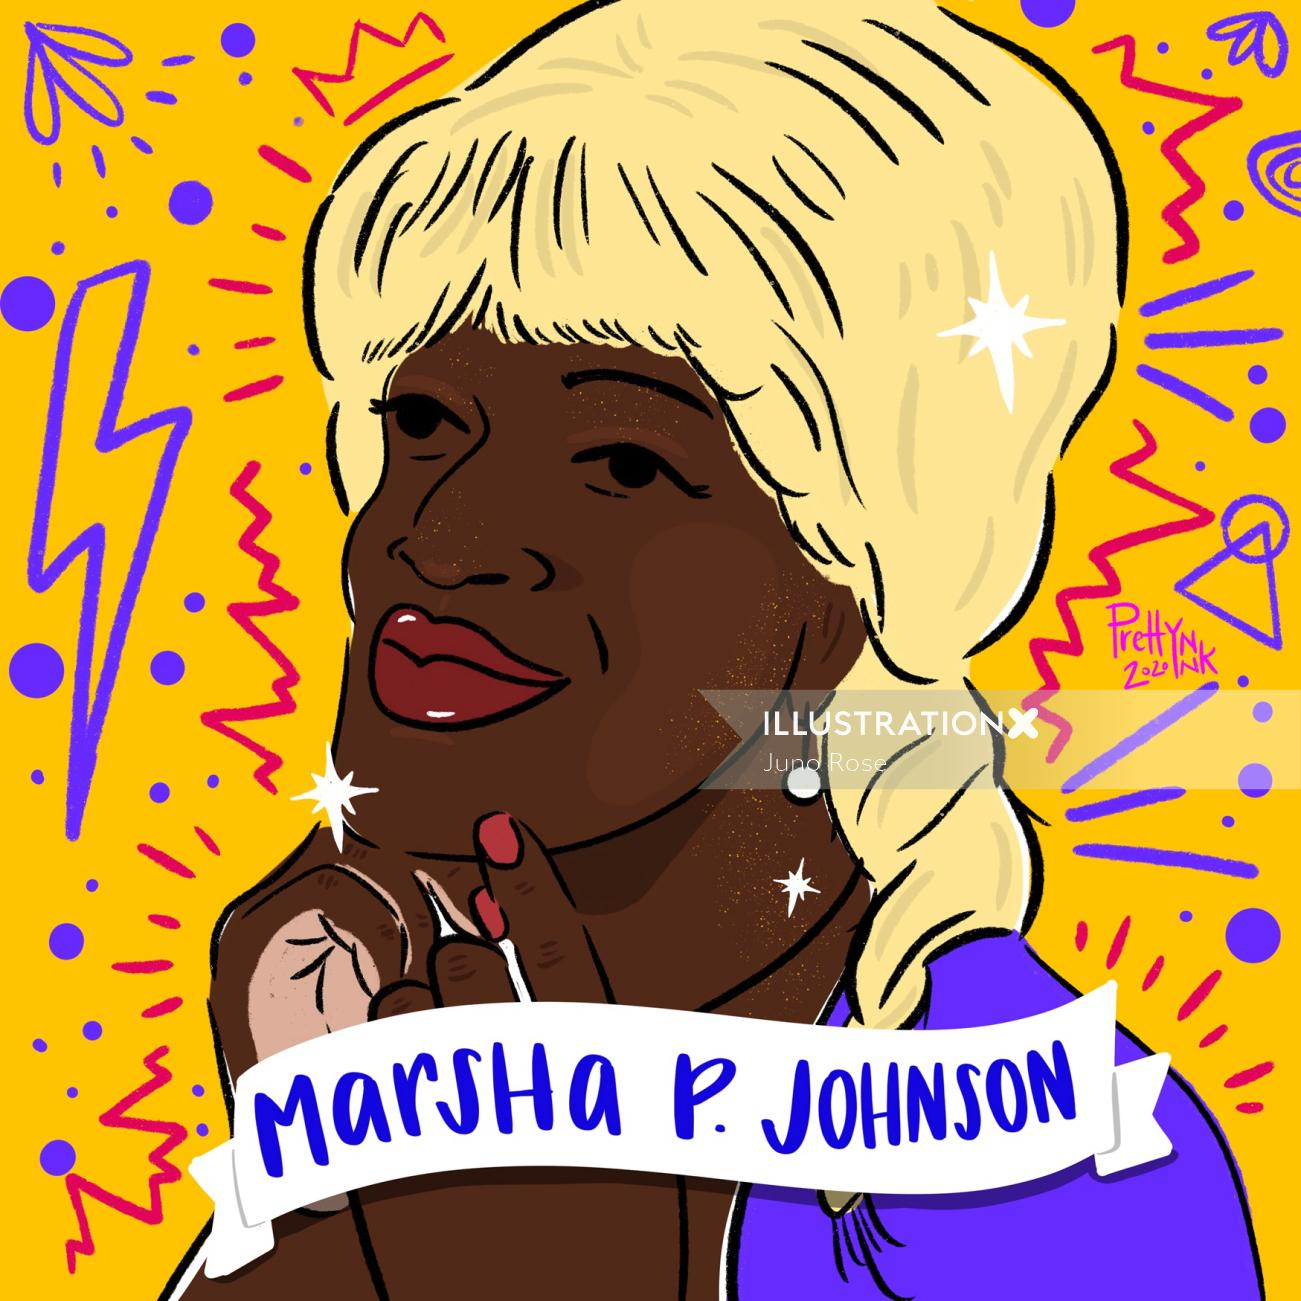 Portrait of Marsha P Johnson